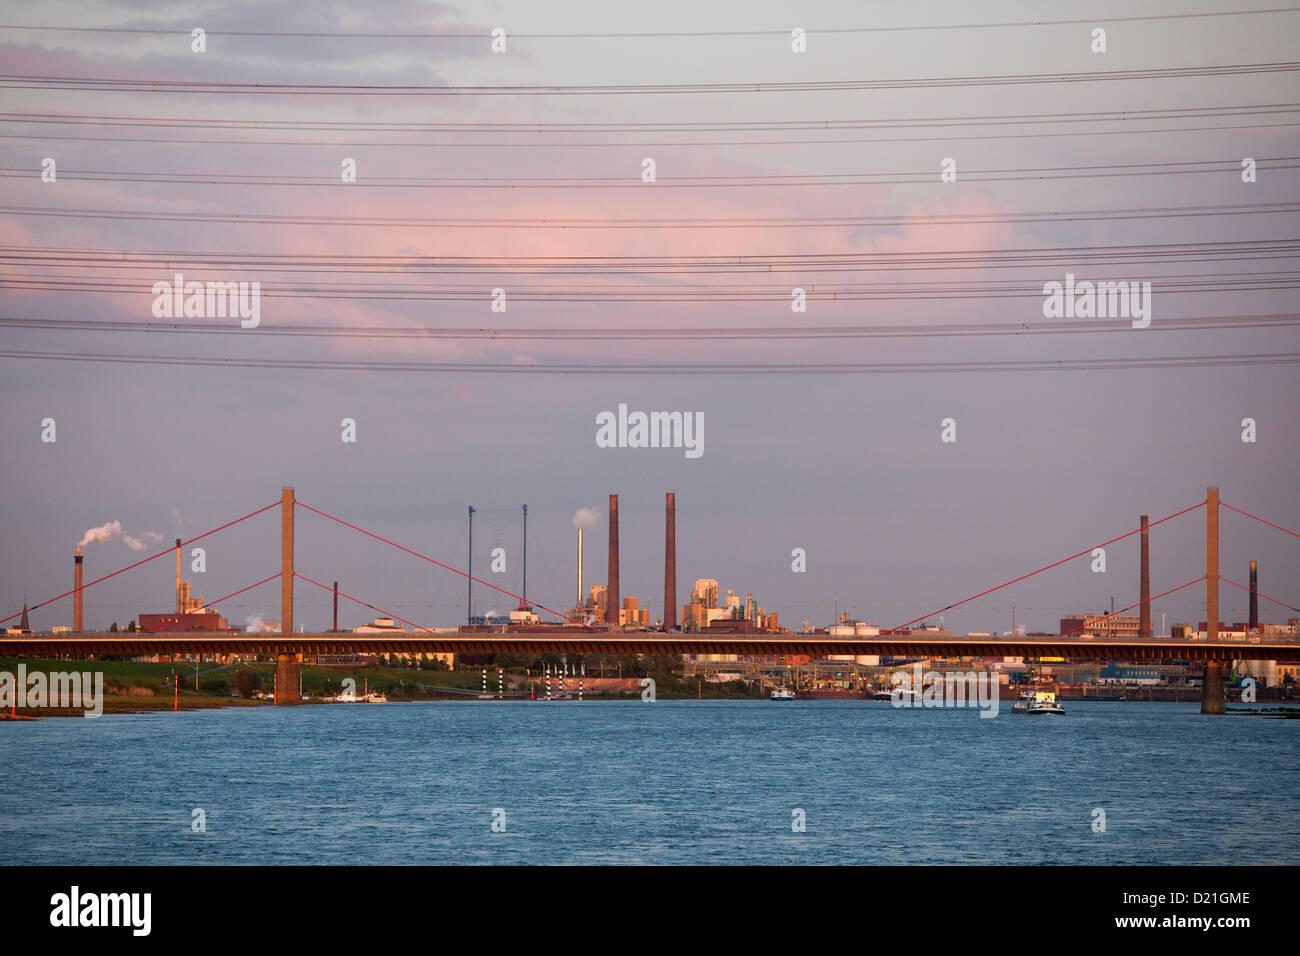 Rhine river and Bayer chemical and pharmaceutical company factory chimneys at dusk, Leverkusen, North Rhine-Westphalia, - Stock Image